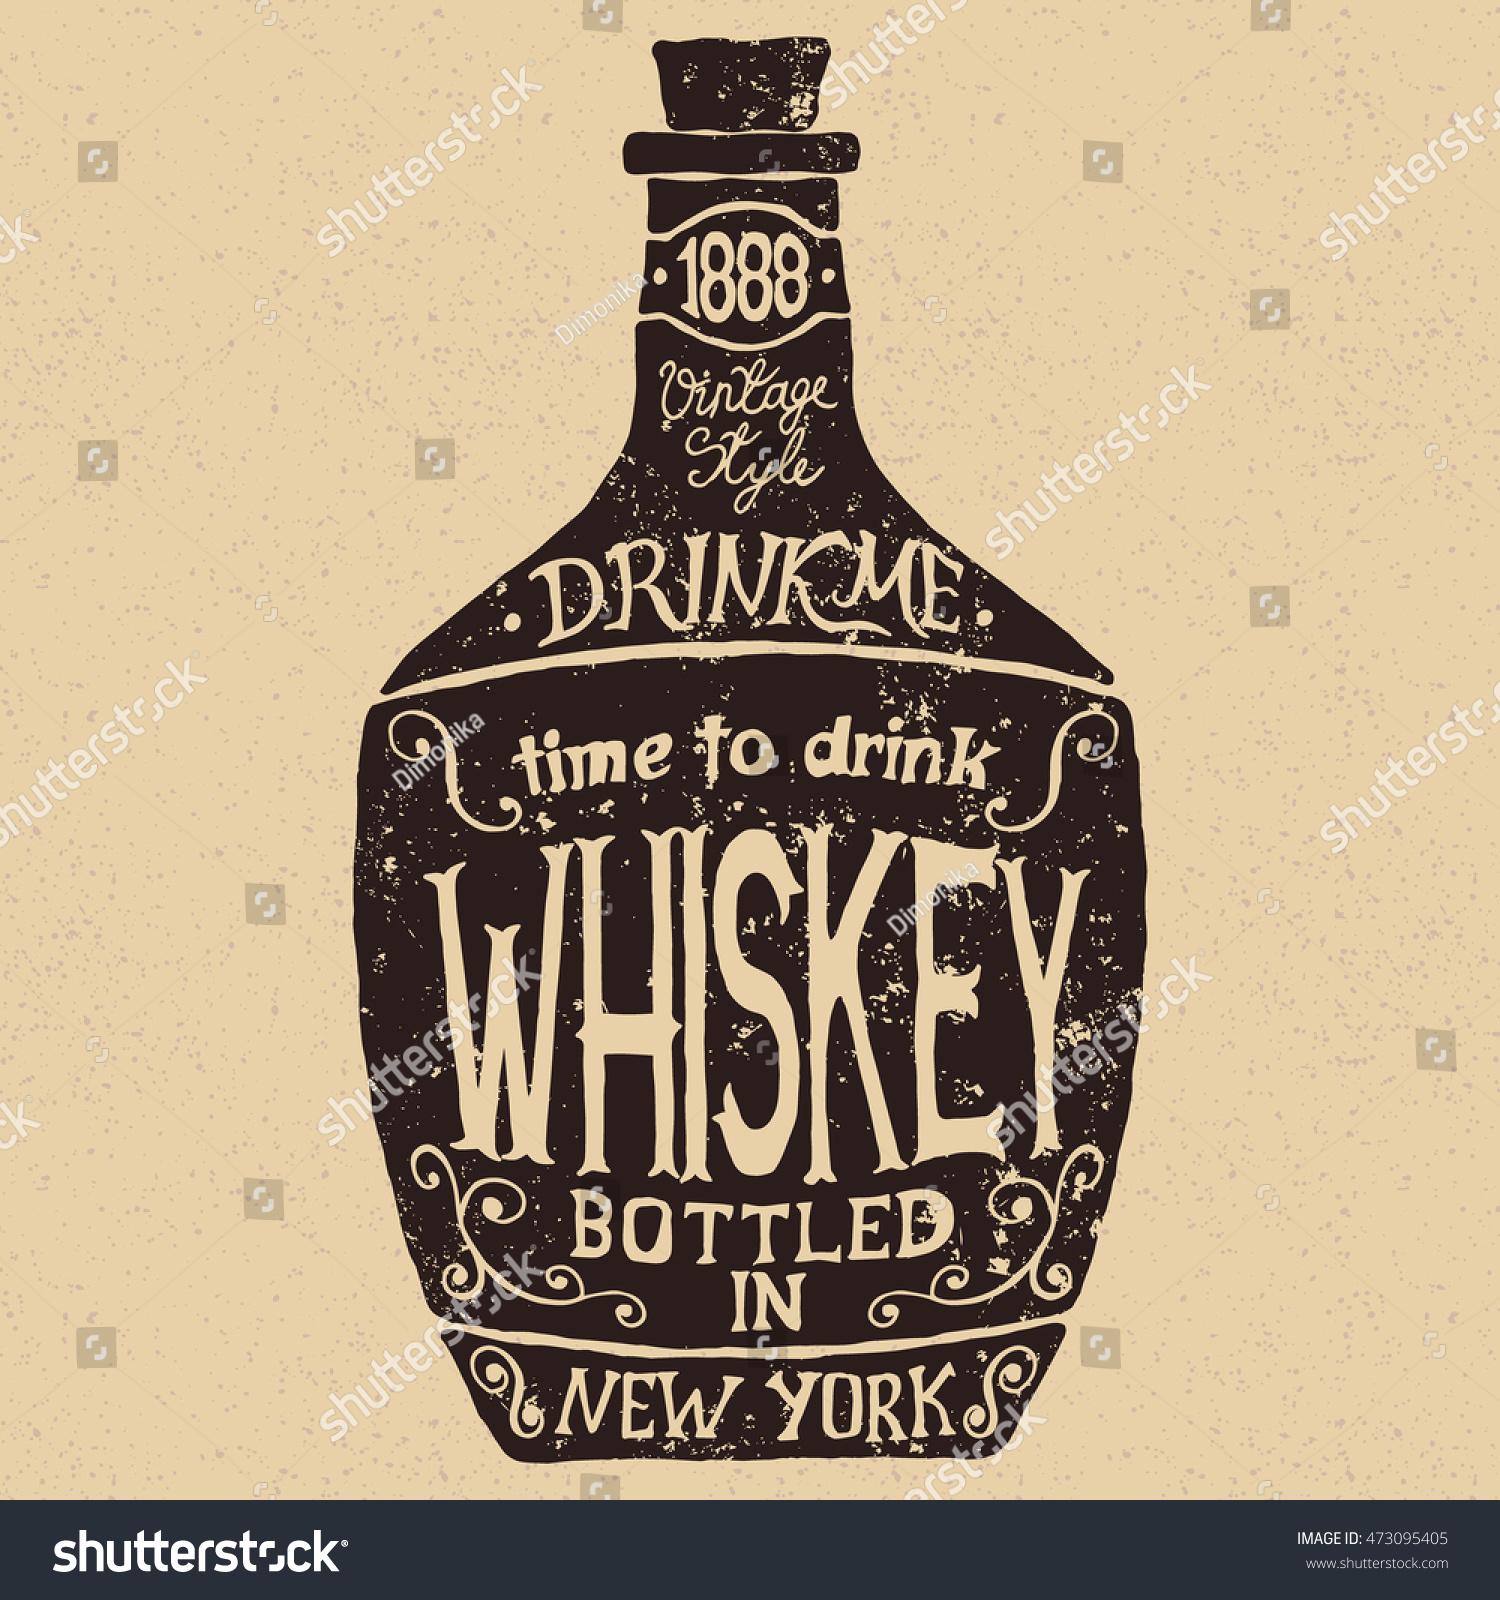 Vintage bottle whiskey letteringvector typography design stock vintage bottle of whiskey with letteringctor typography design of alcoholic drinks biocorpaavc Gallery